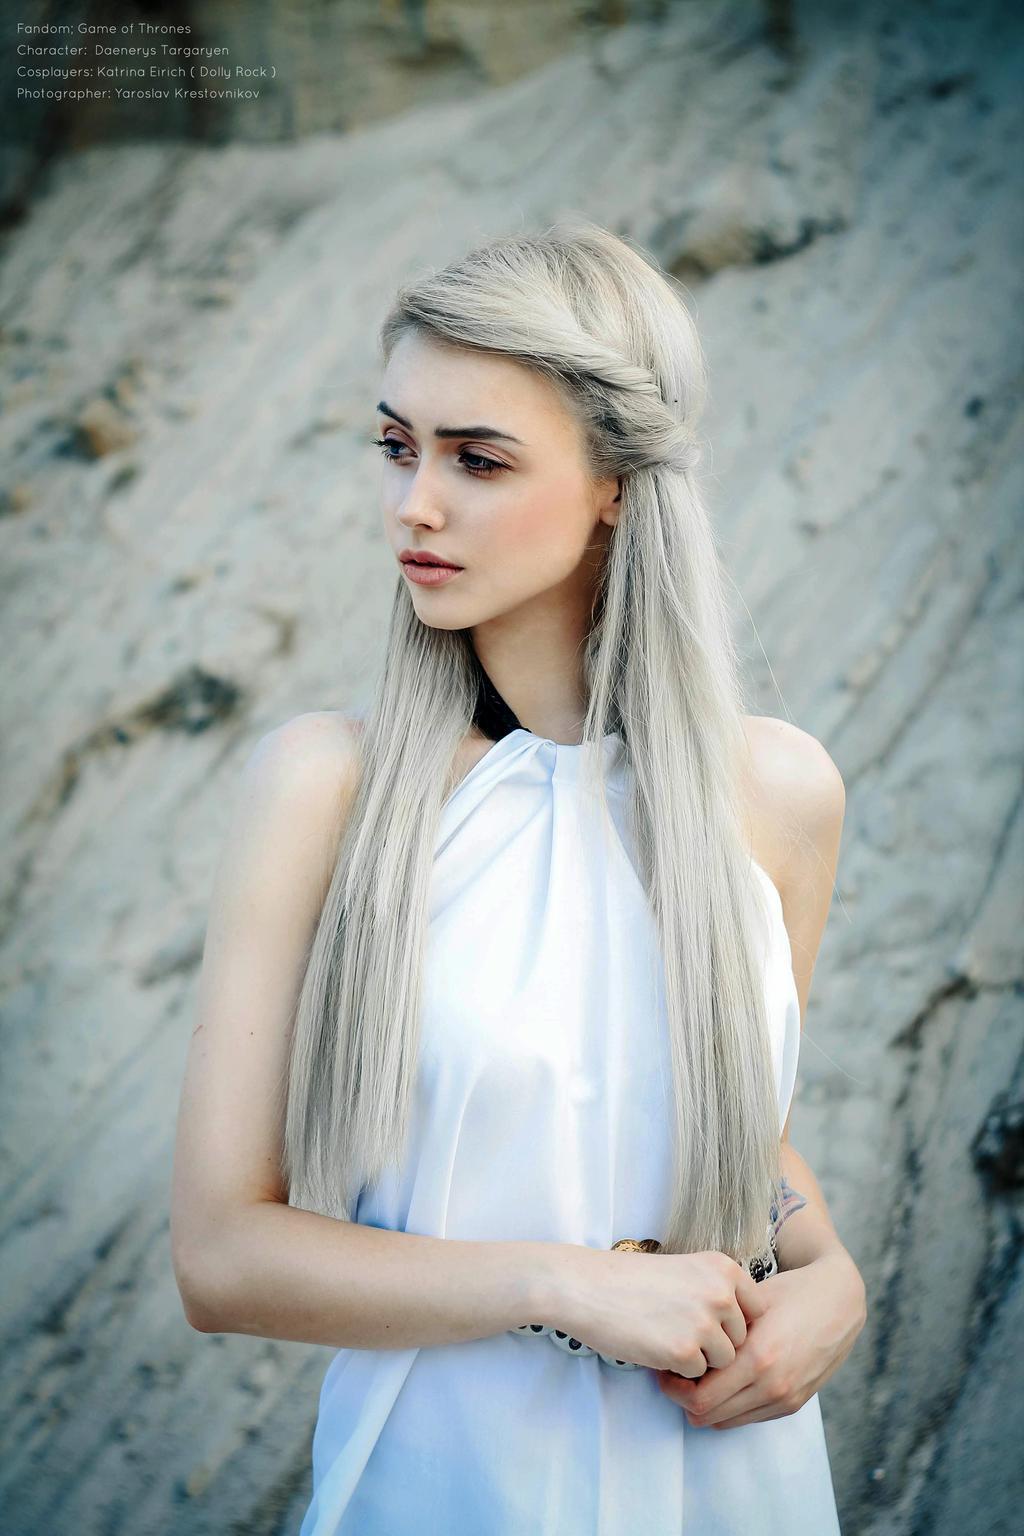 daenerys targaryen cosplay by dollyrock on deviantart. Black Bedroom Furniture Sets. Home Design Ideas